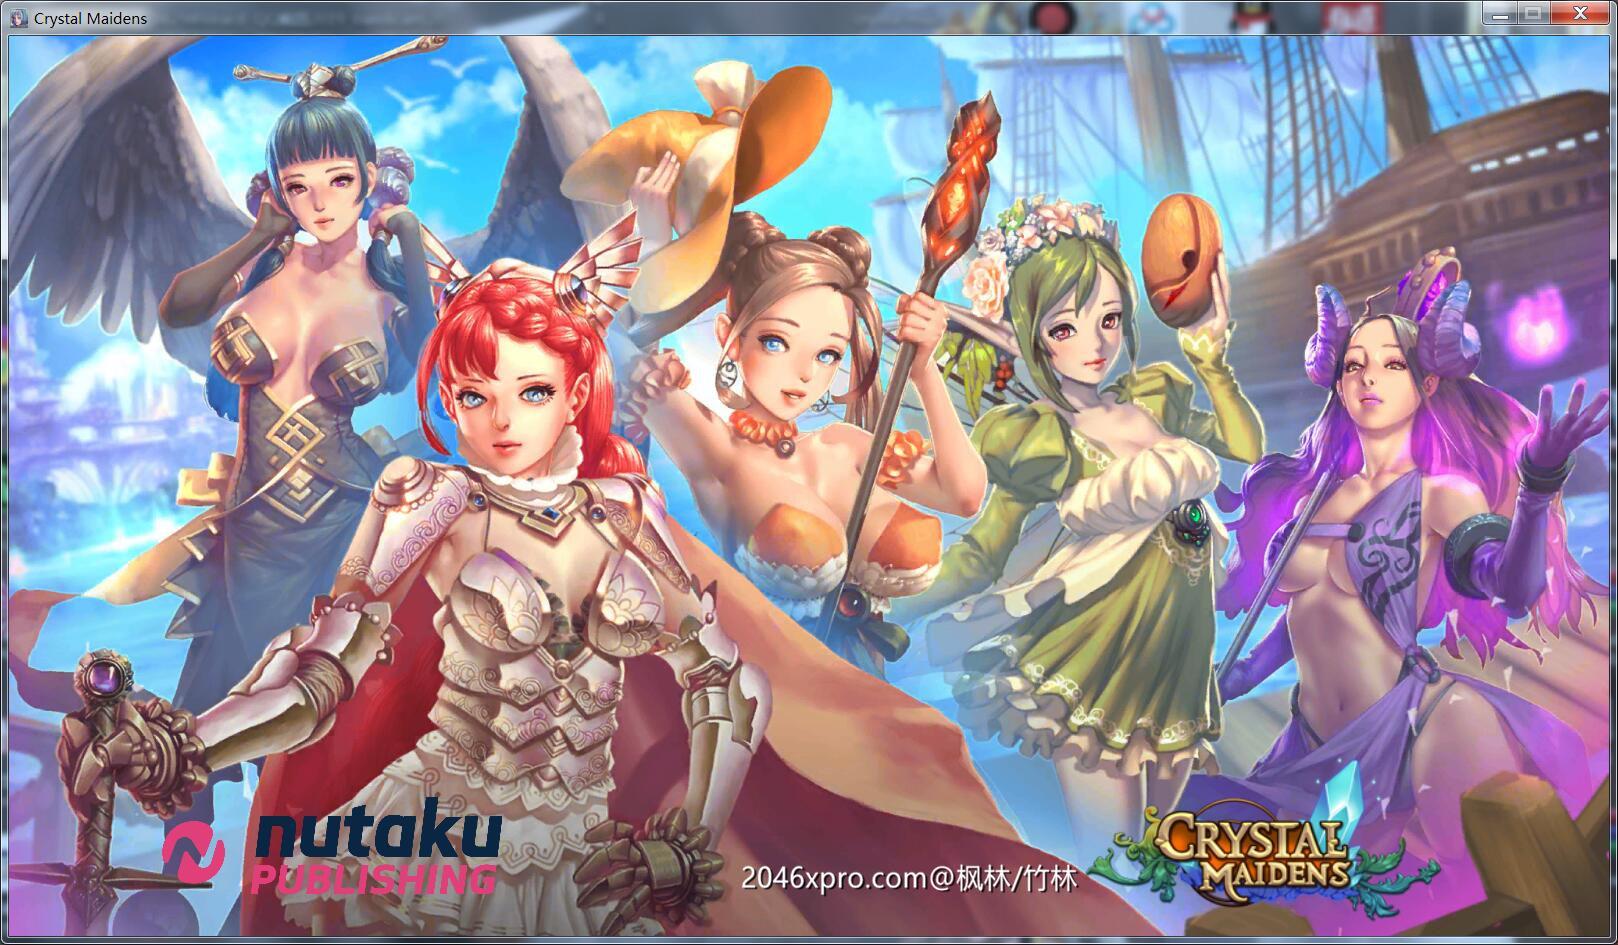 [策略网游/中文/全动态]水晶少女 Crystal Maidens V.1.8 高压中文版[PC+安卓][300M] - 咿呜游戏